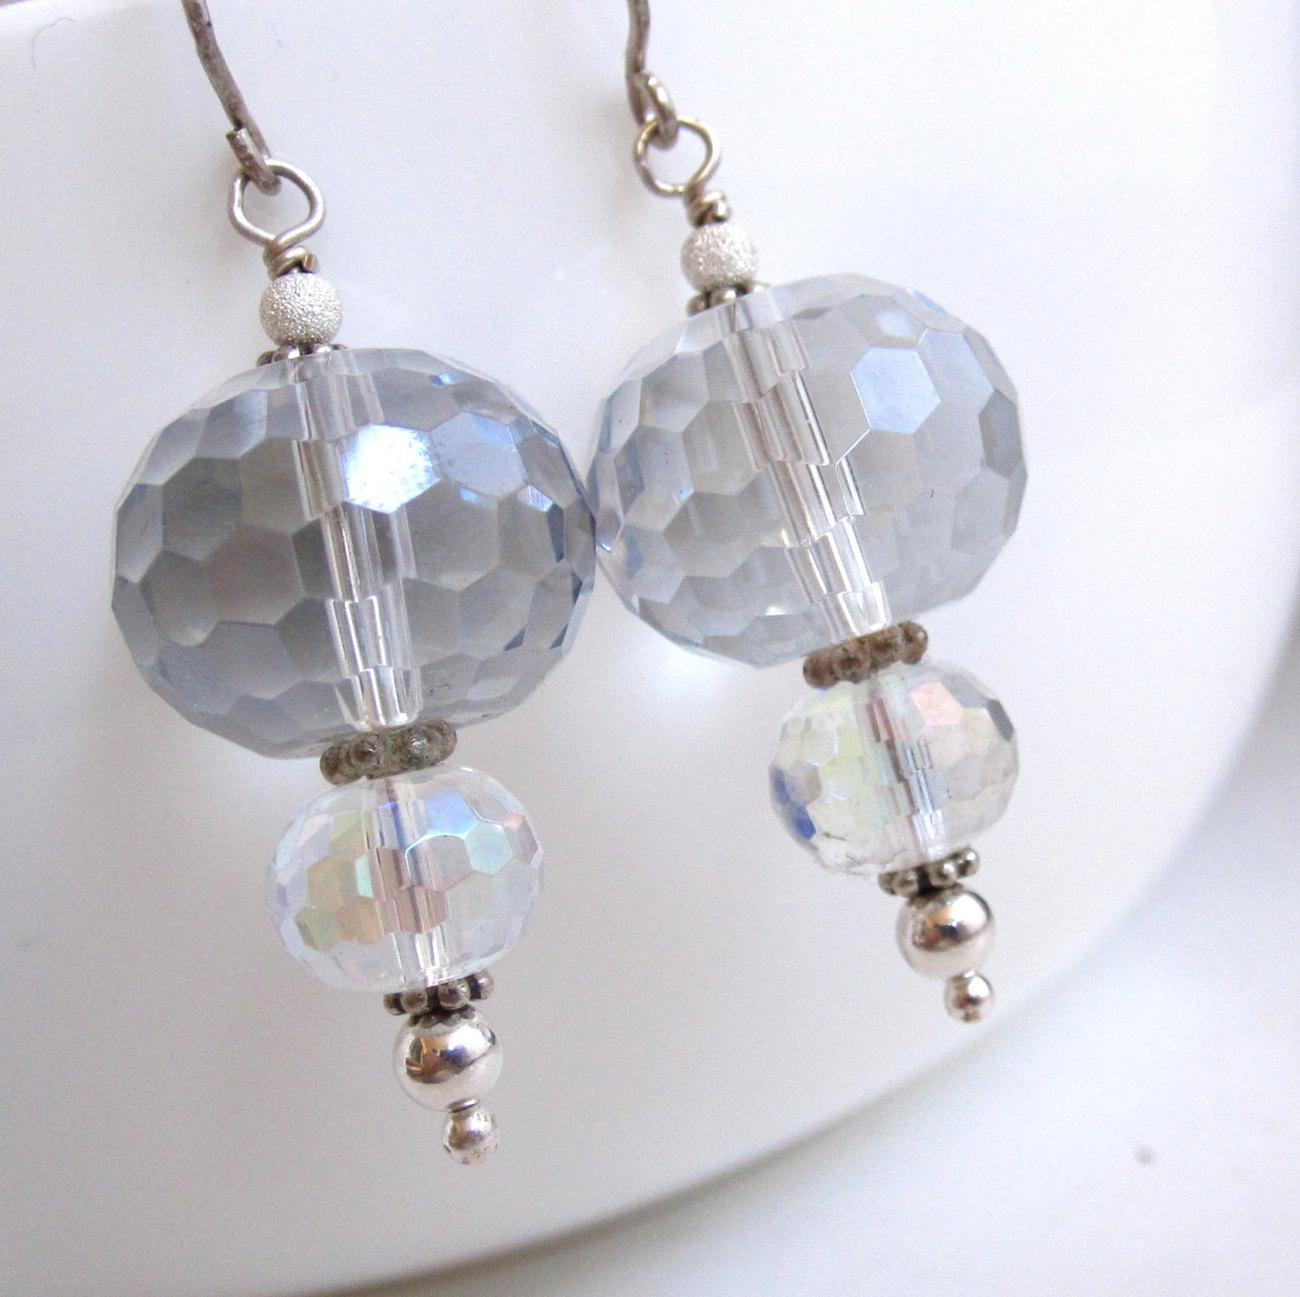 Crystal Lantern Earrings - Mystic Quartz and Sterling